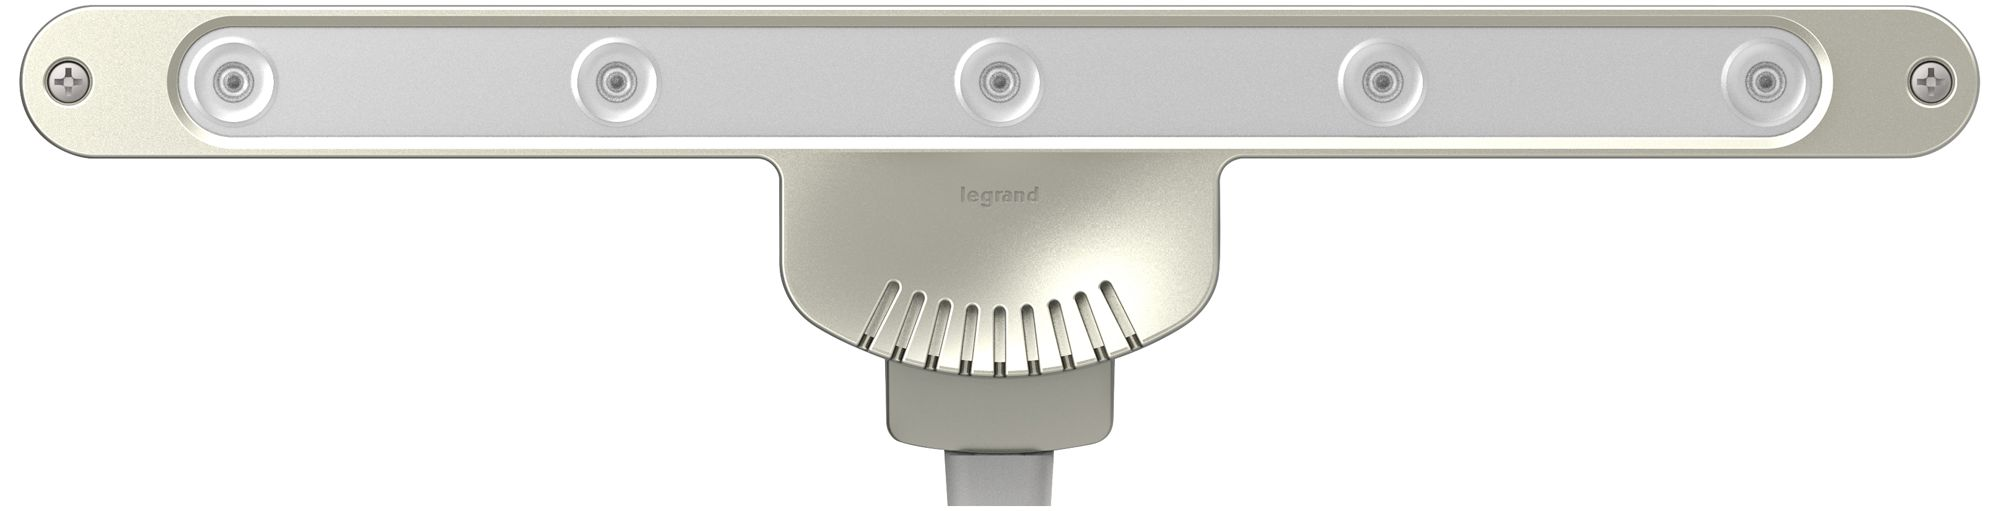 legrand under cabinet lights lamps plus